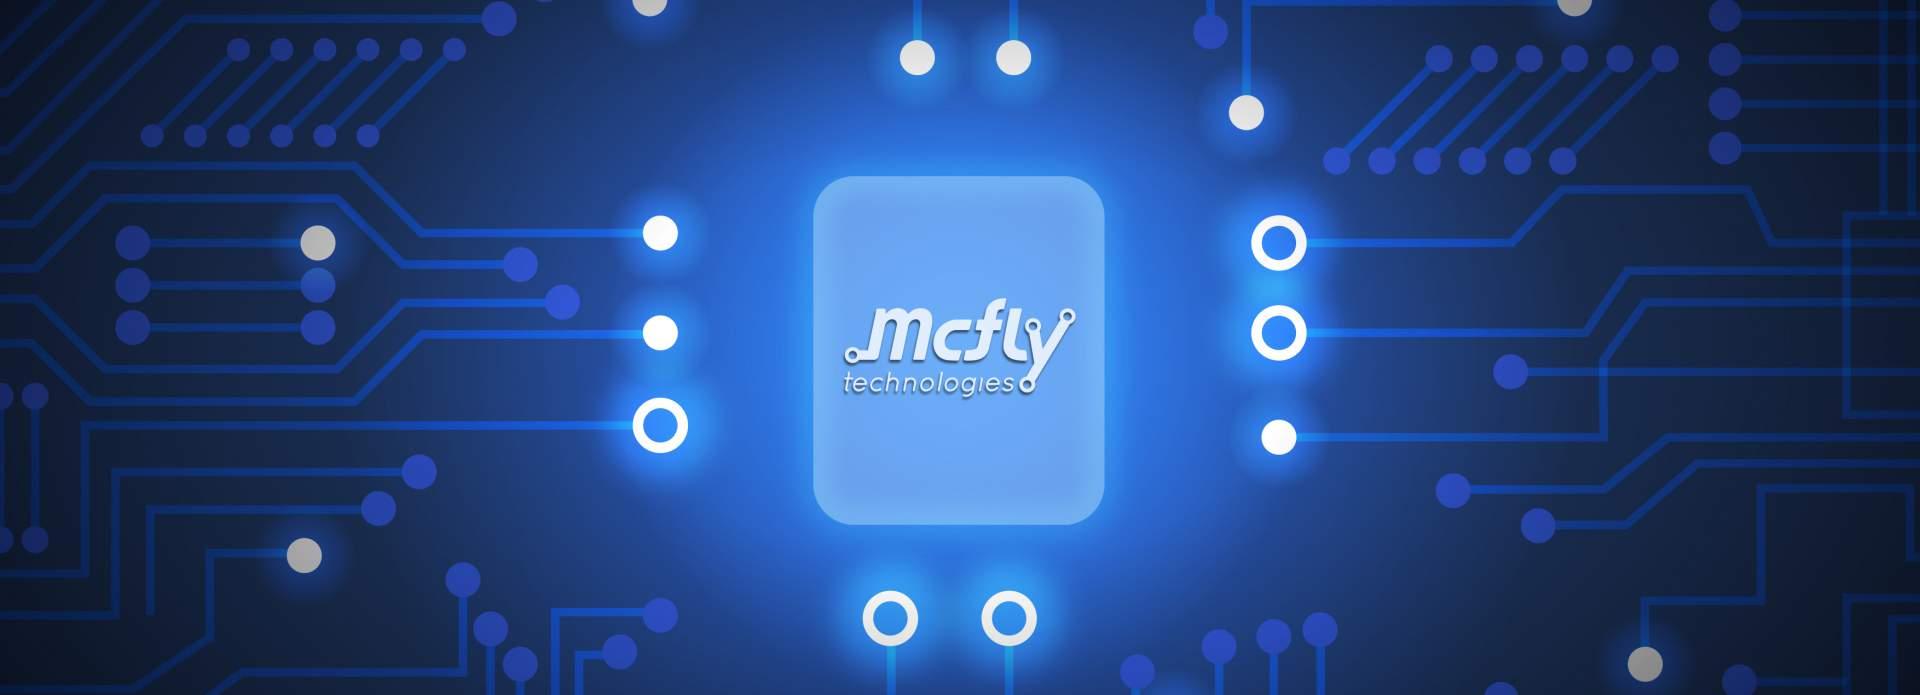 image McFly Tecnologies